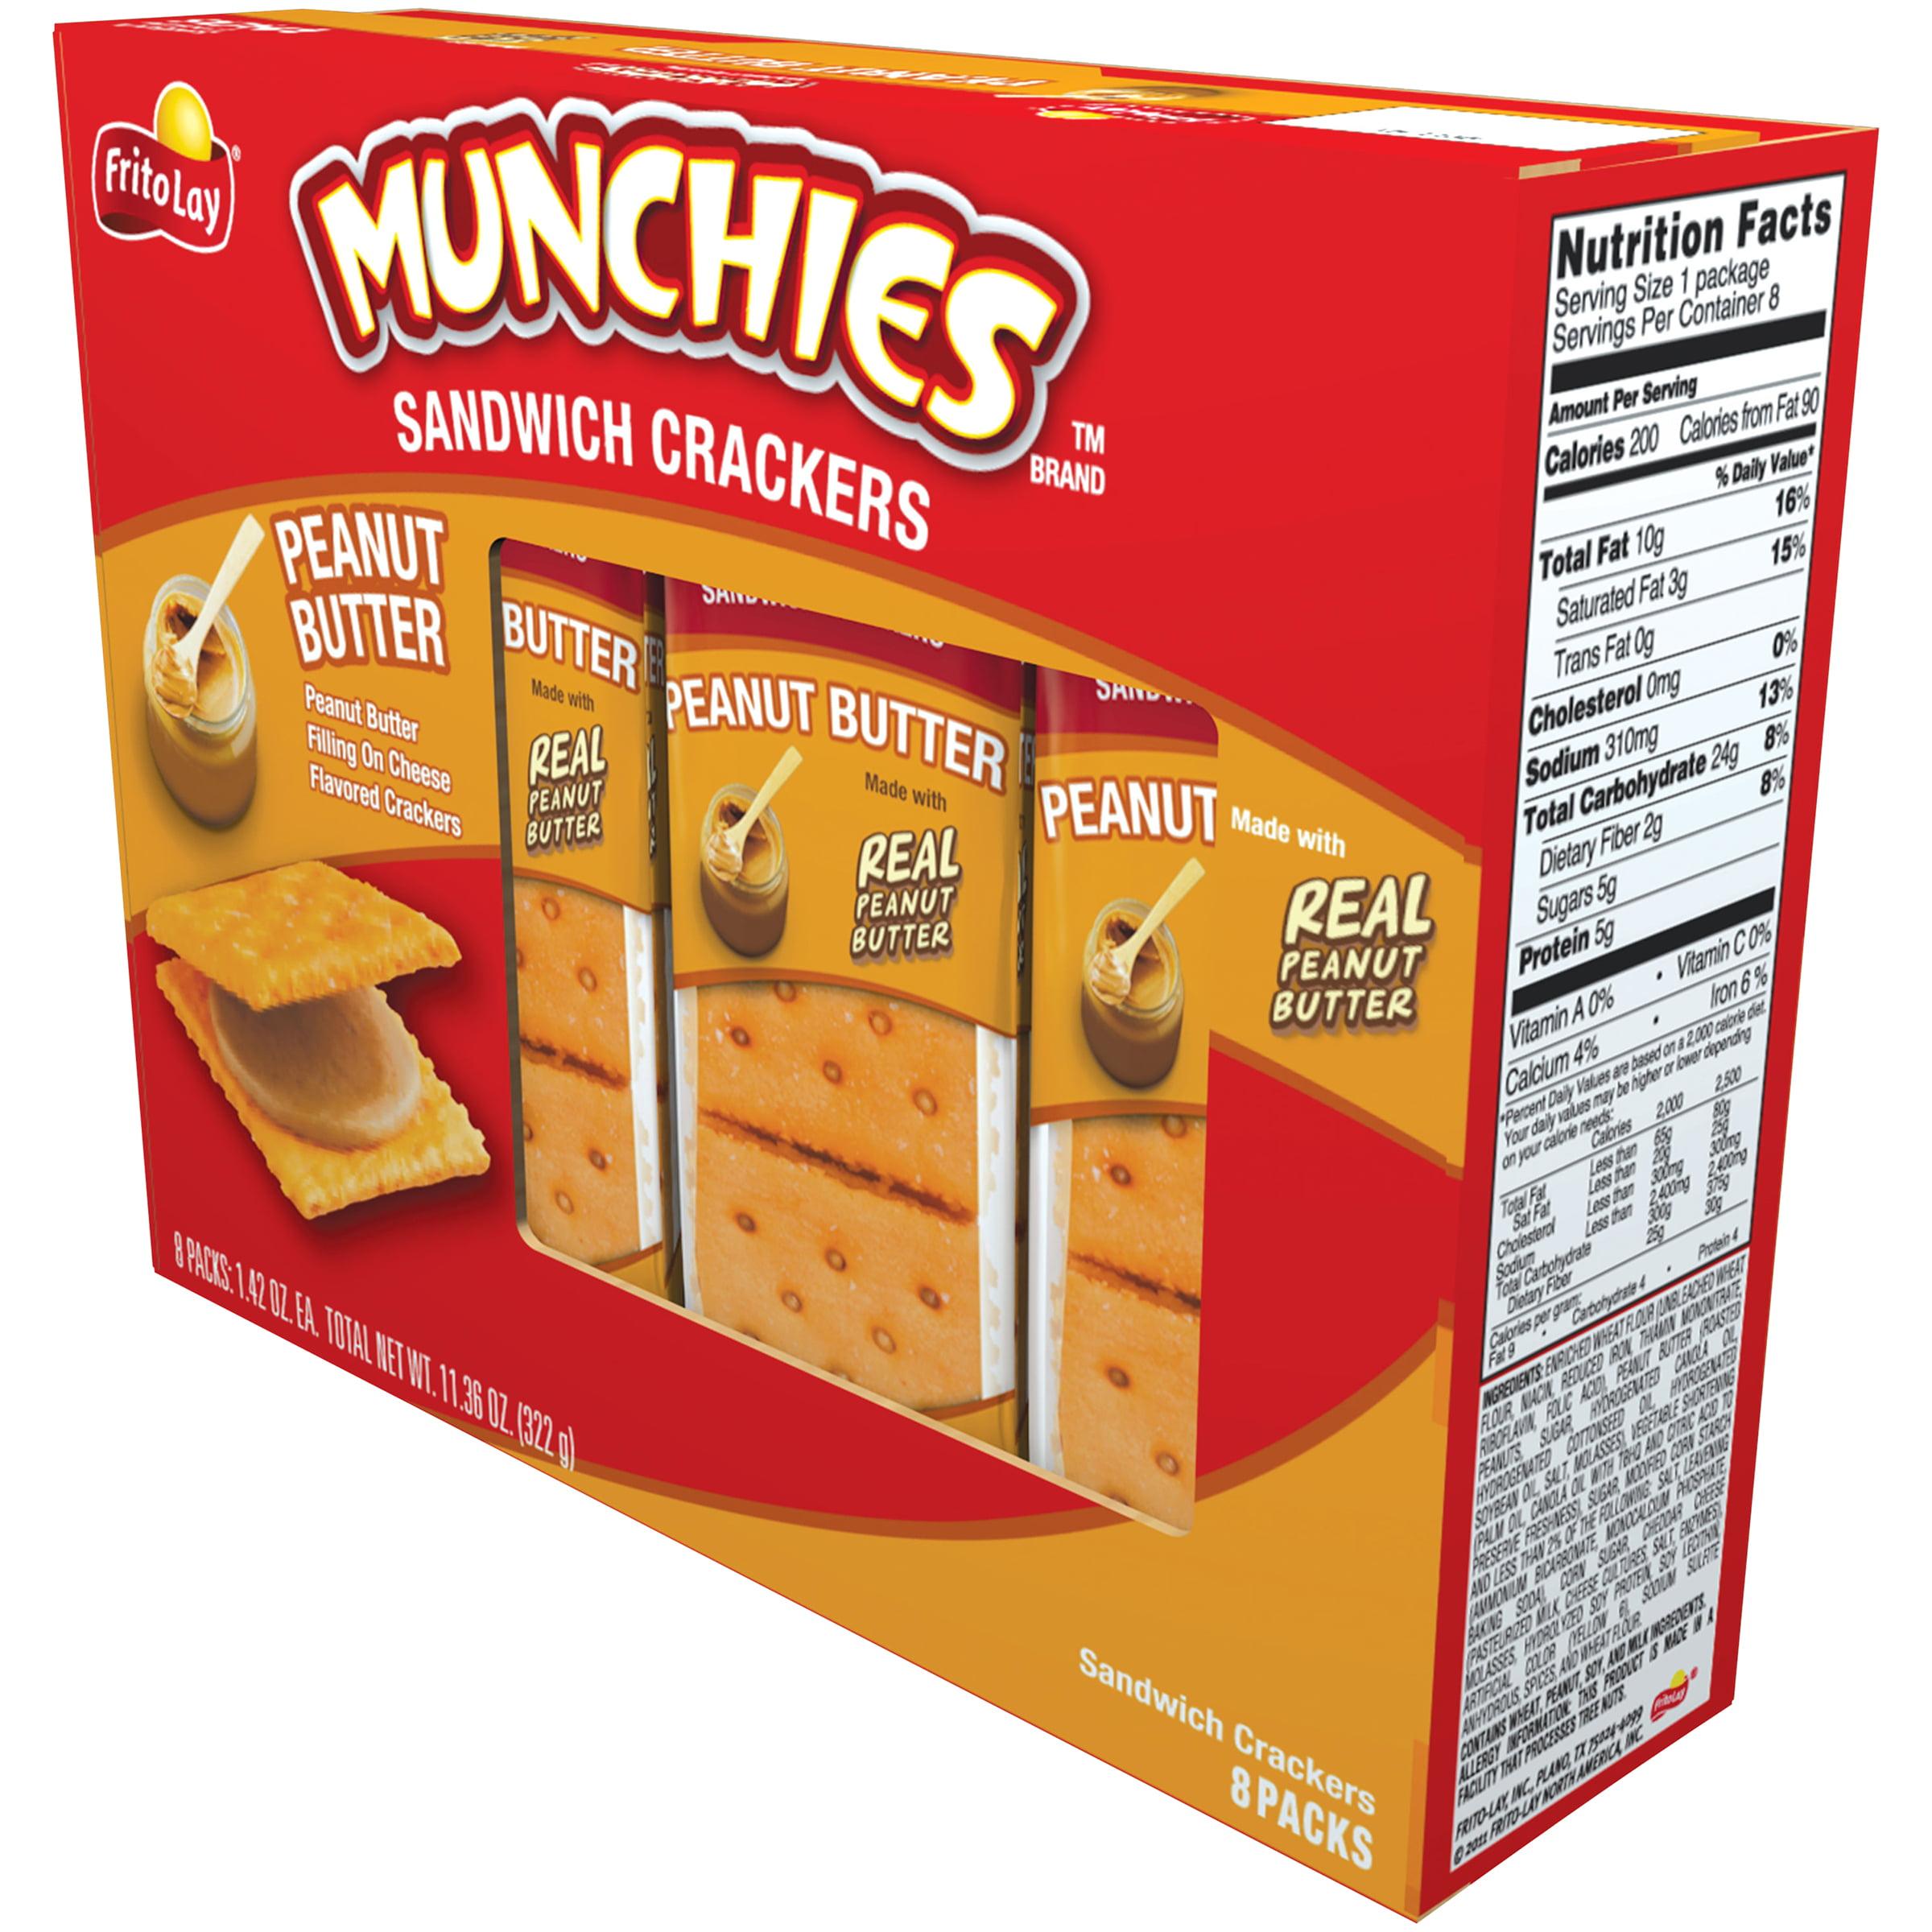 Munchies Peanut Butter Sandwich Crackers, 1.42 Oz., 8